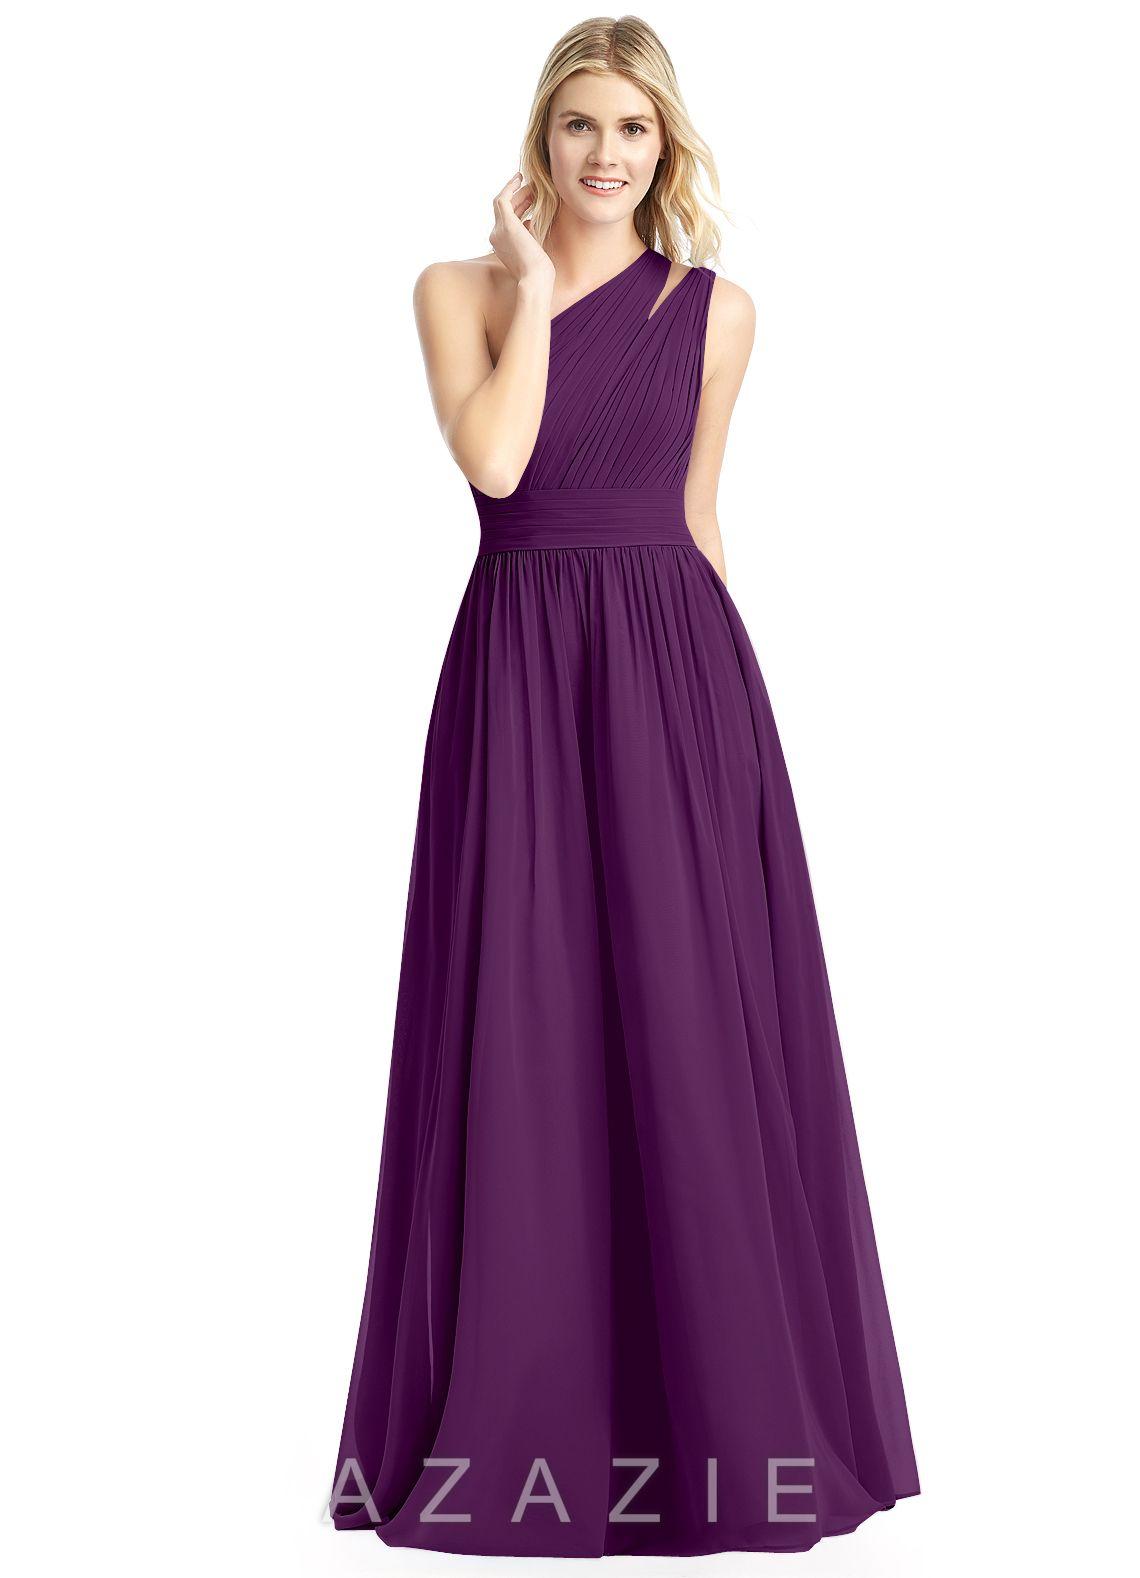 MOLLY - Bridesmaid Dress | Damas